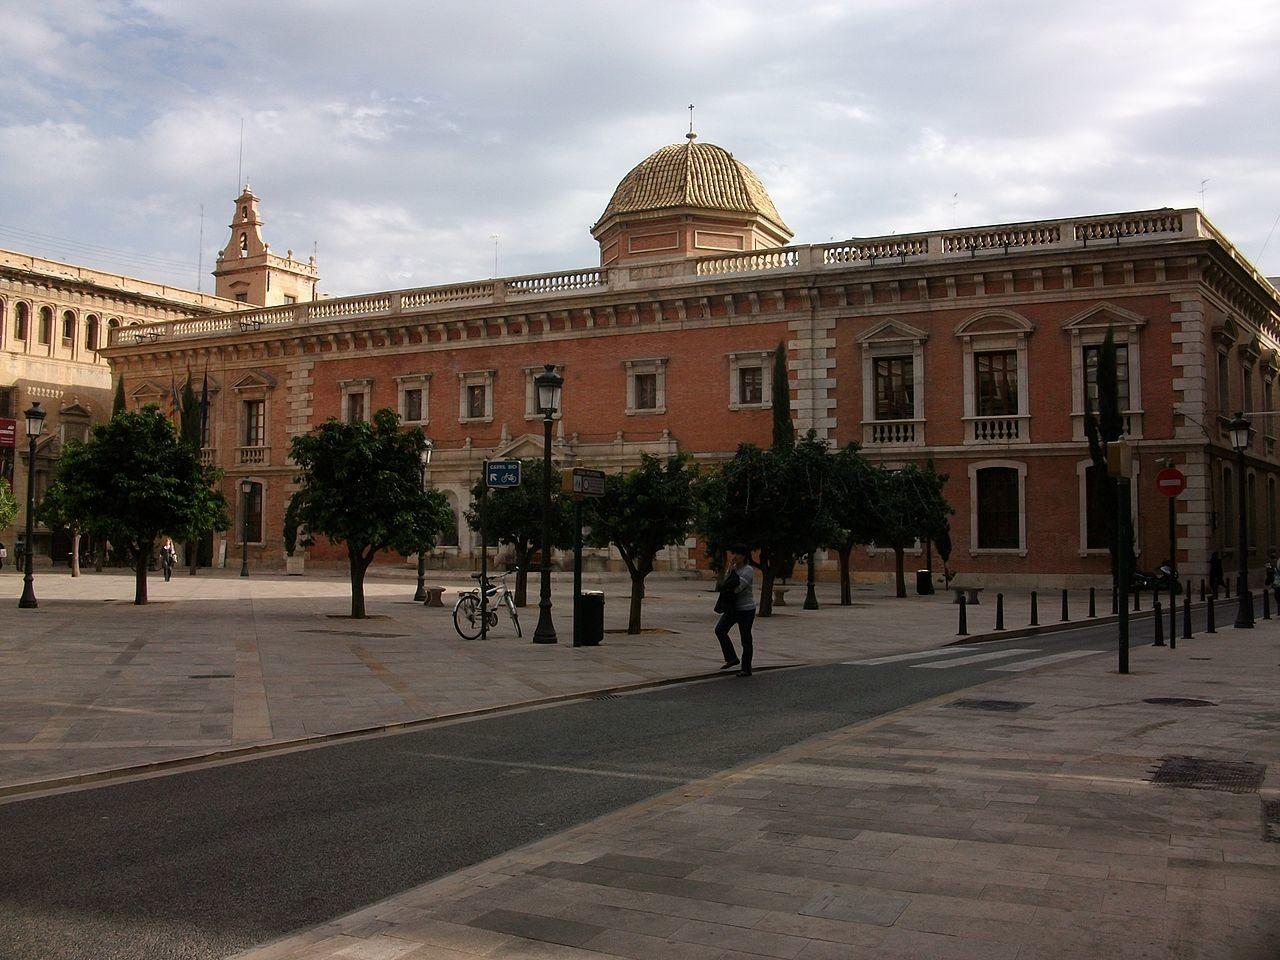 L'esperienza alla Universidad Politècnica de Valéncia (Spagna) di Adrianna